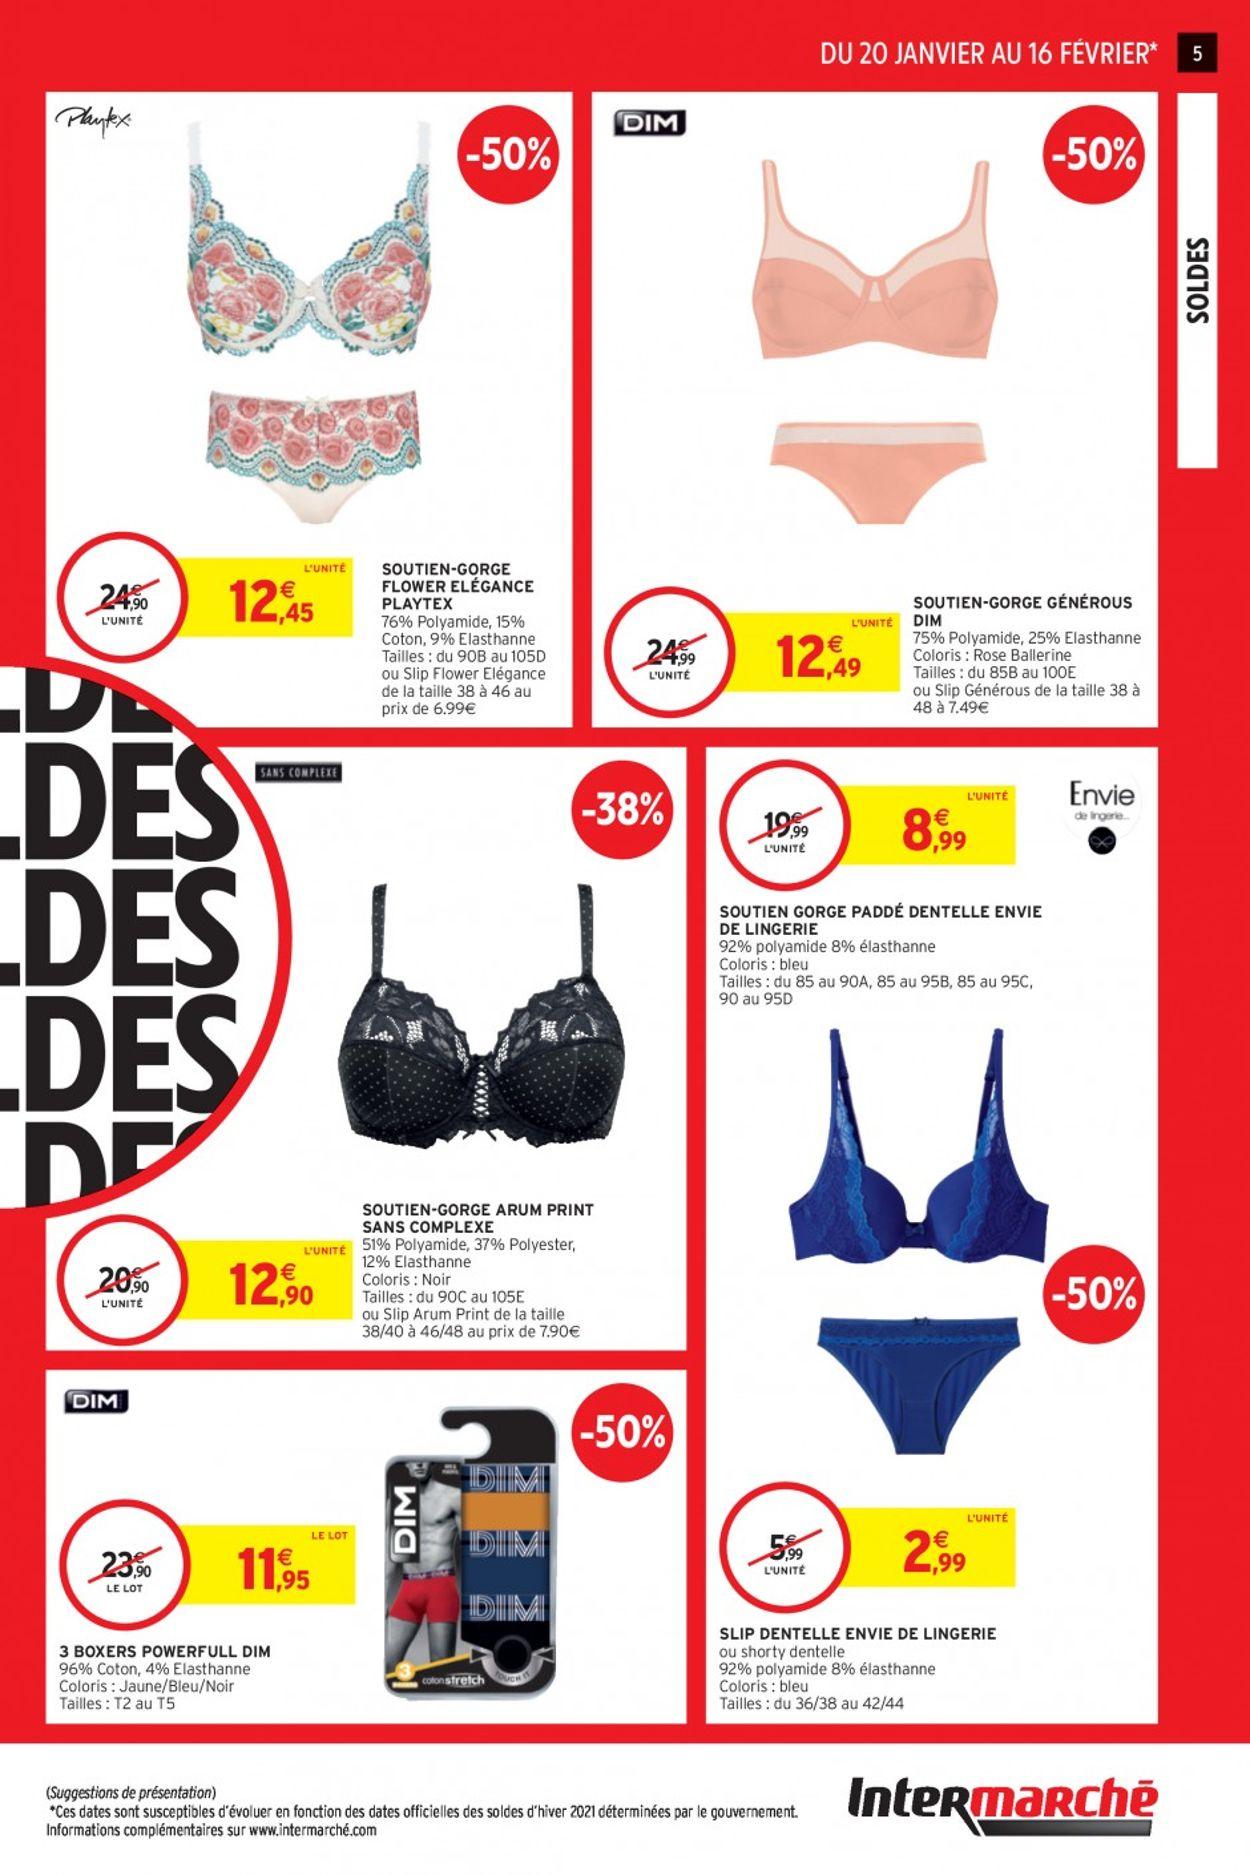 Intermarché Soldes 2021 Catalogue - 20.01-16.02.2021 (Page 5)